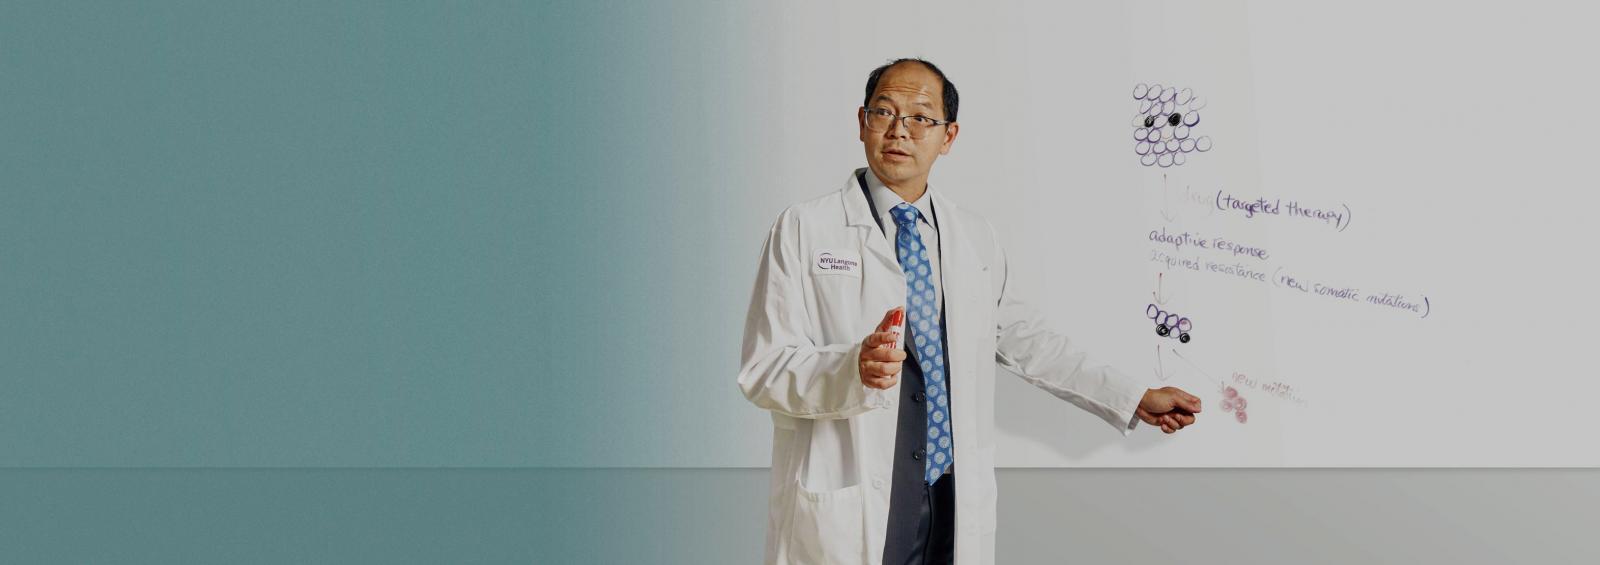 Division of Hematology & Medical Oncology | NYU Langone Health